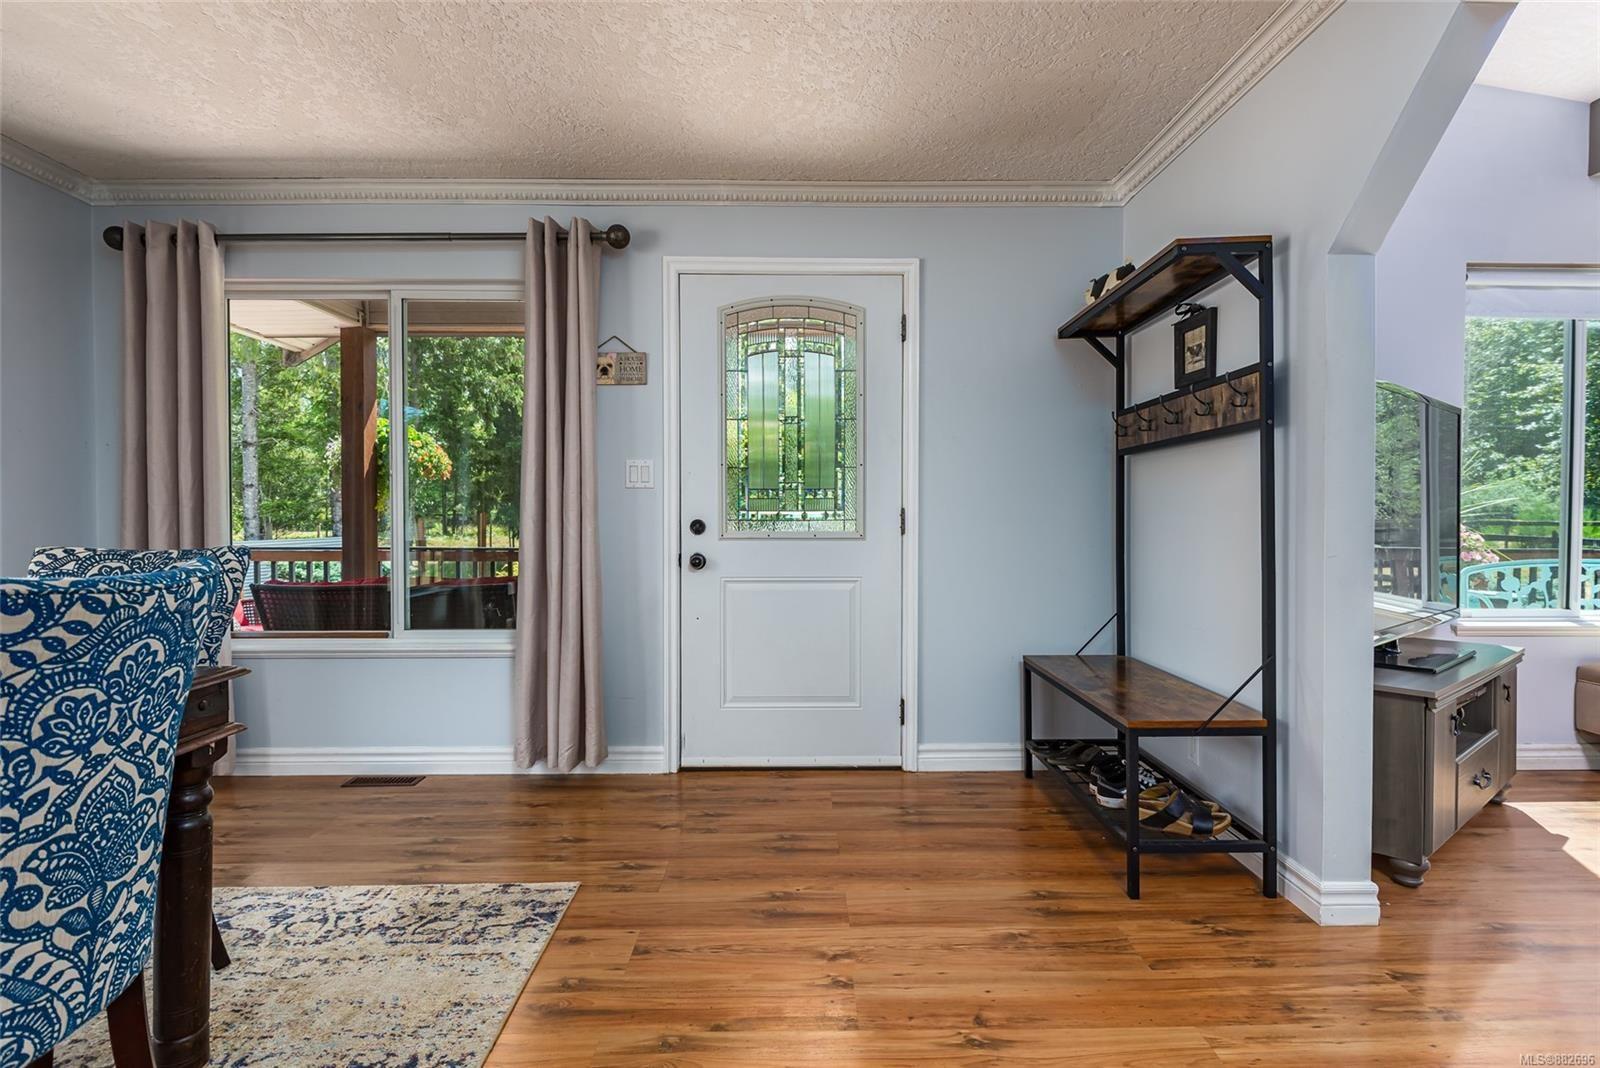 Photo 8: Photos: 3554 MacAulay Rd in : CV Merville Black Creek House for sale (Comox Valley)  : MLS®# 882696